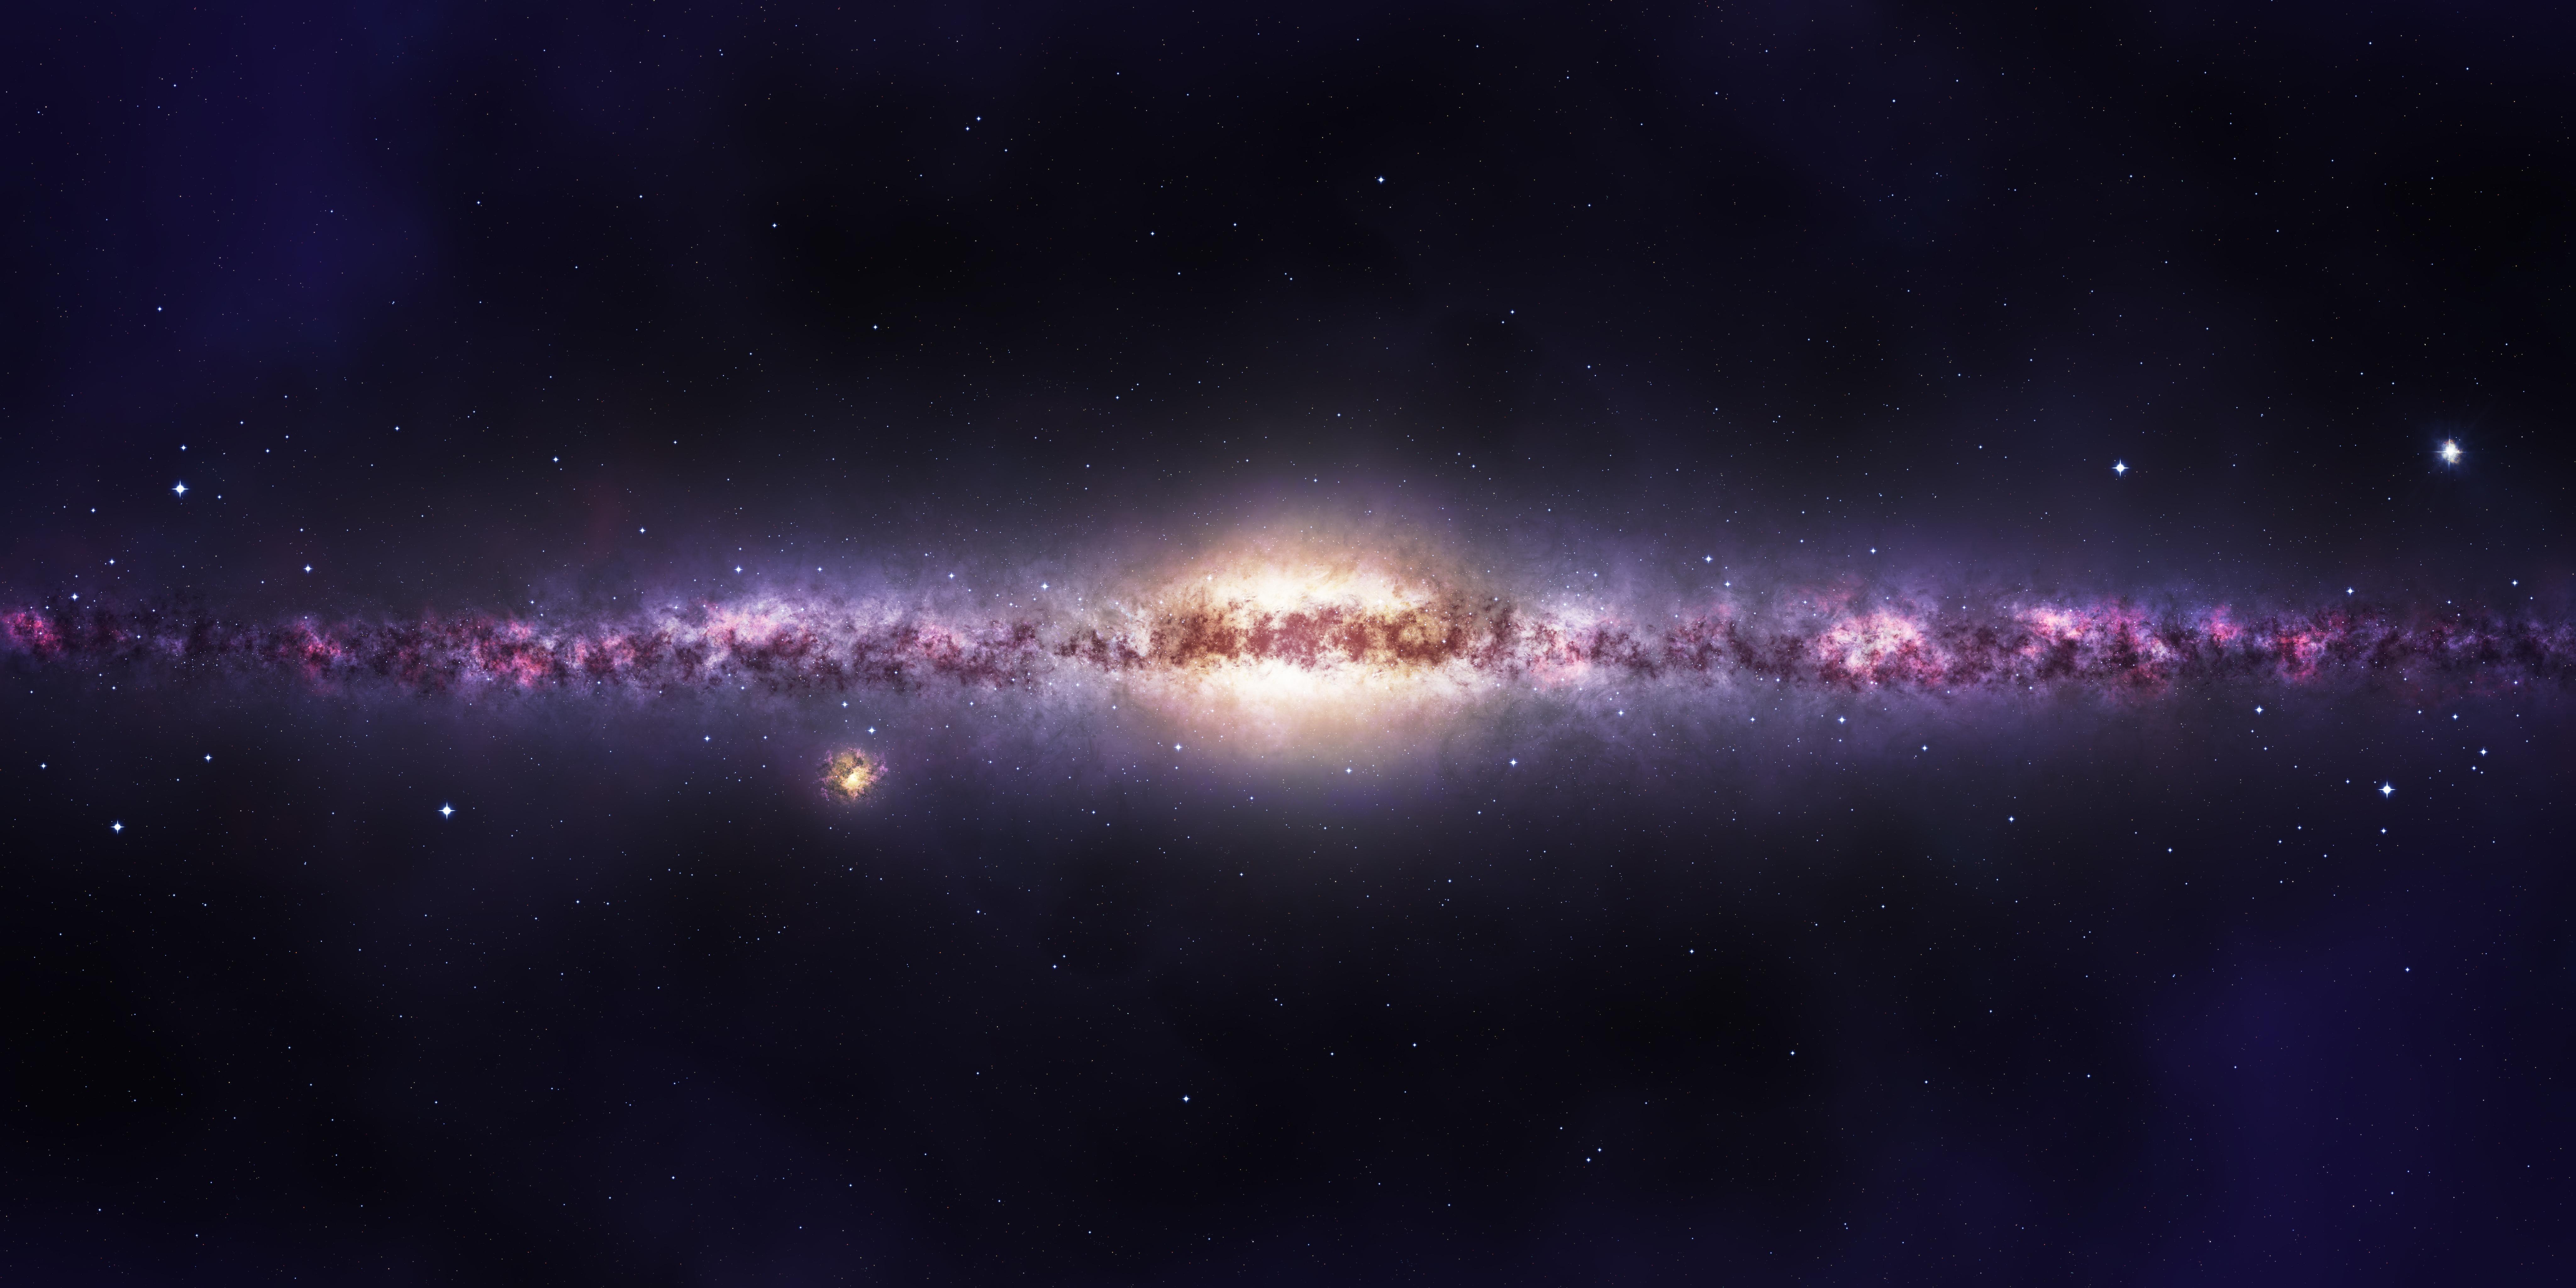 milky way galaxy - HD1920×1080